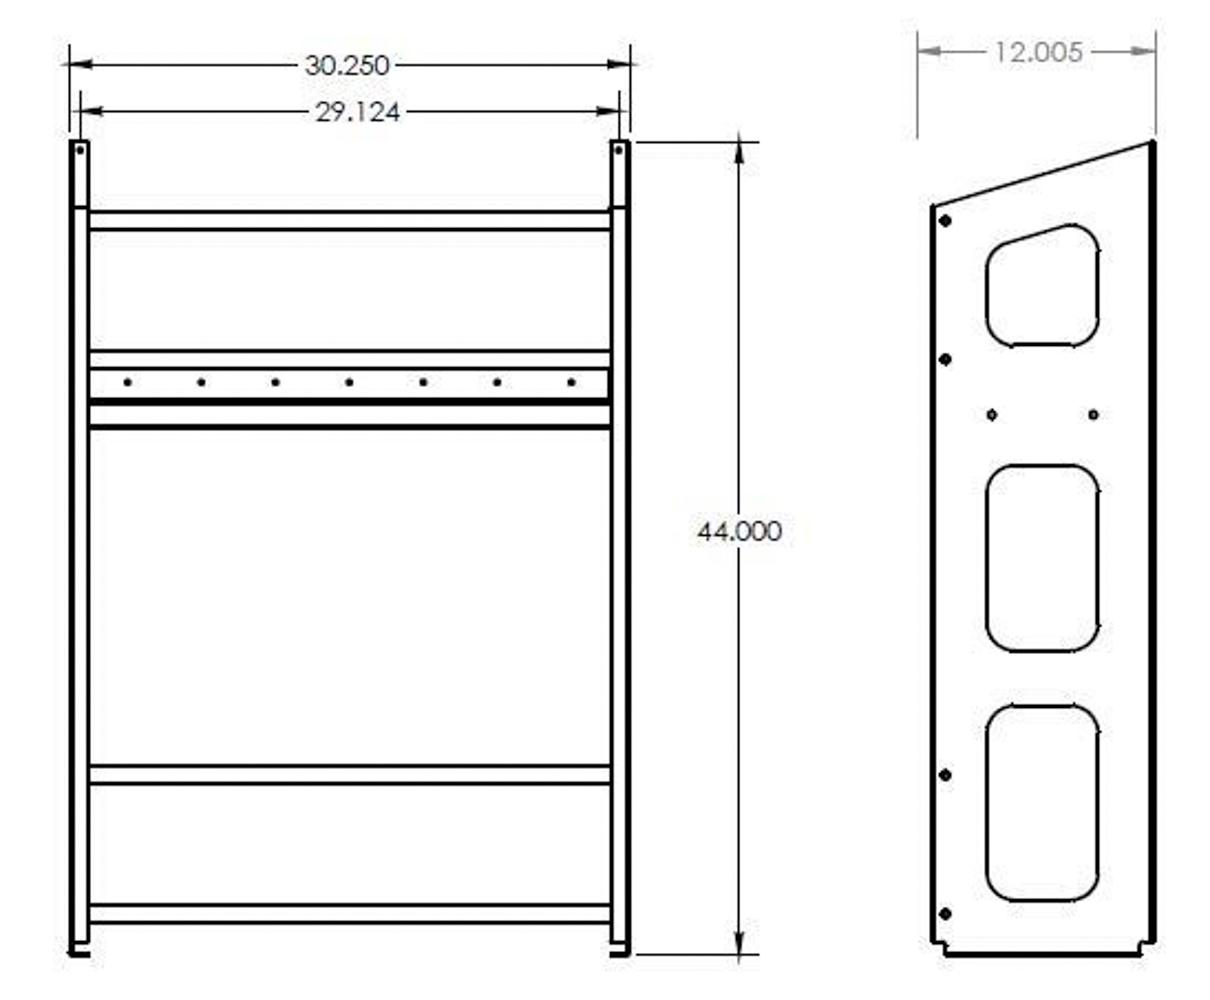 Hepfner Racing Products HRP6359-6-BLK Utility Jug Rack, 6 Bay, 30-1/4 x 44 x 12 in, Aluminum, Black Powder Coat, Each